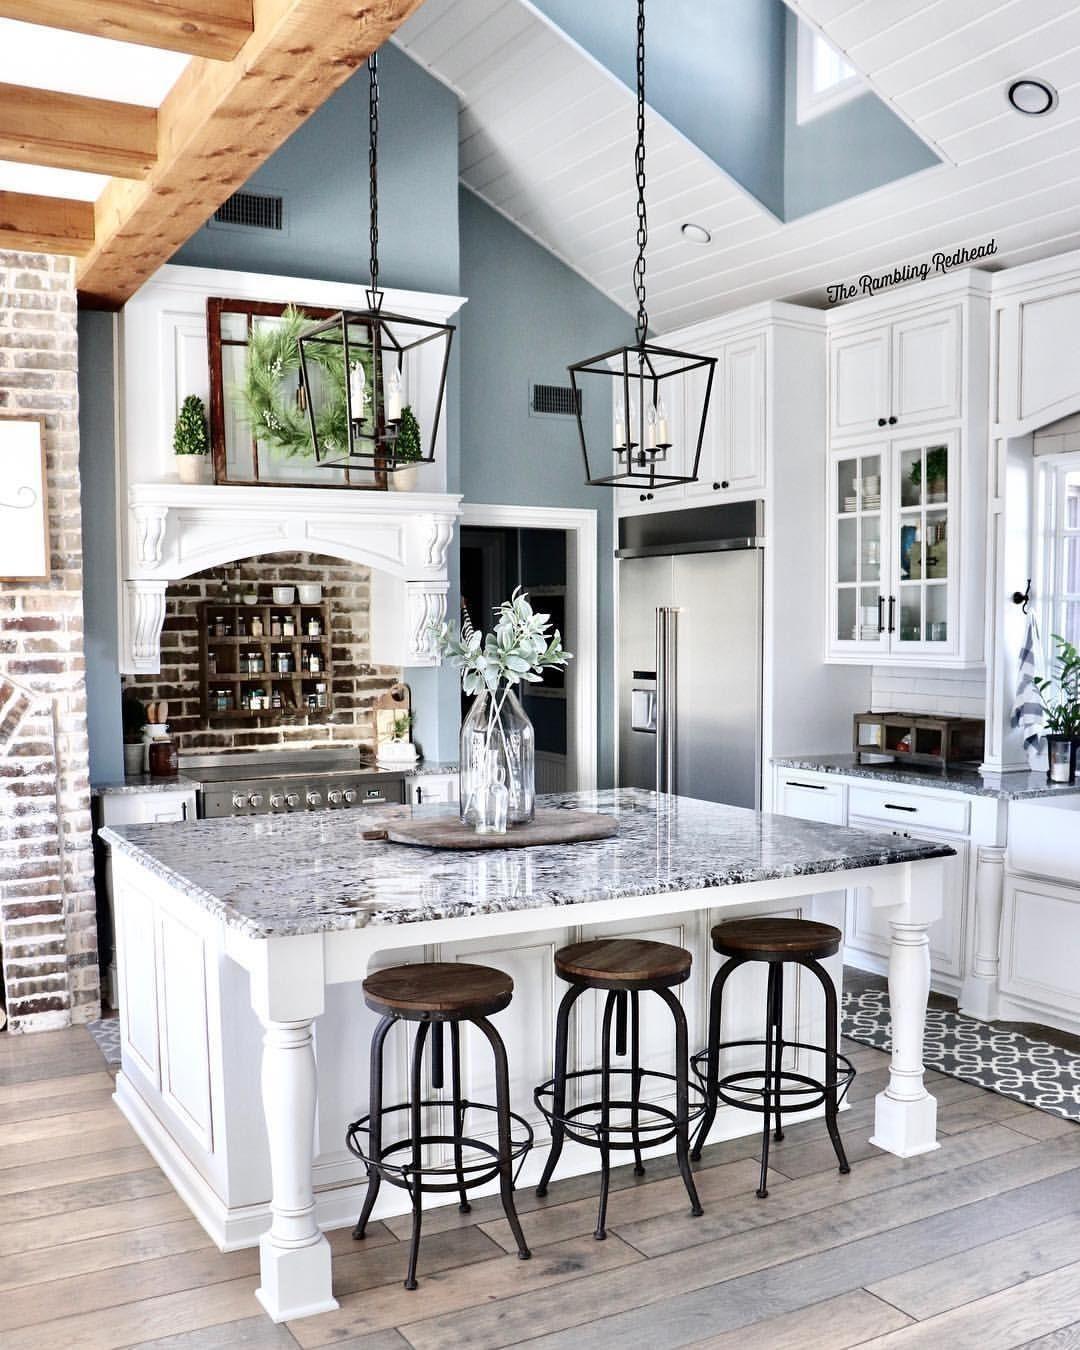 44 inspiring bohemian style kitchen decor ideas zyhomy bohemian style kitchen home decor on boho chic kitchen diy id=22820